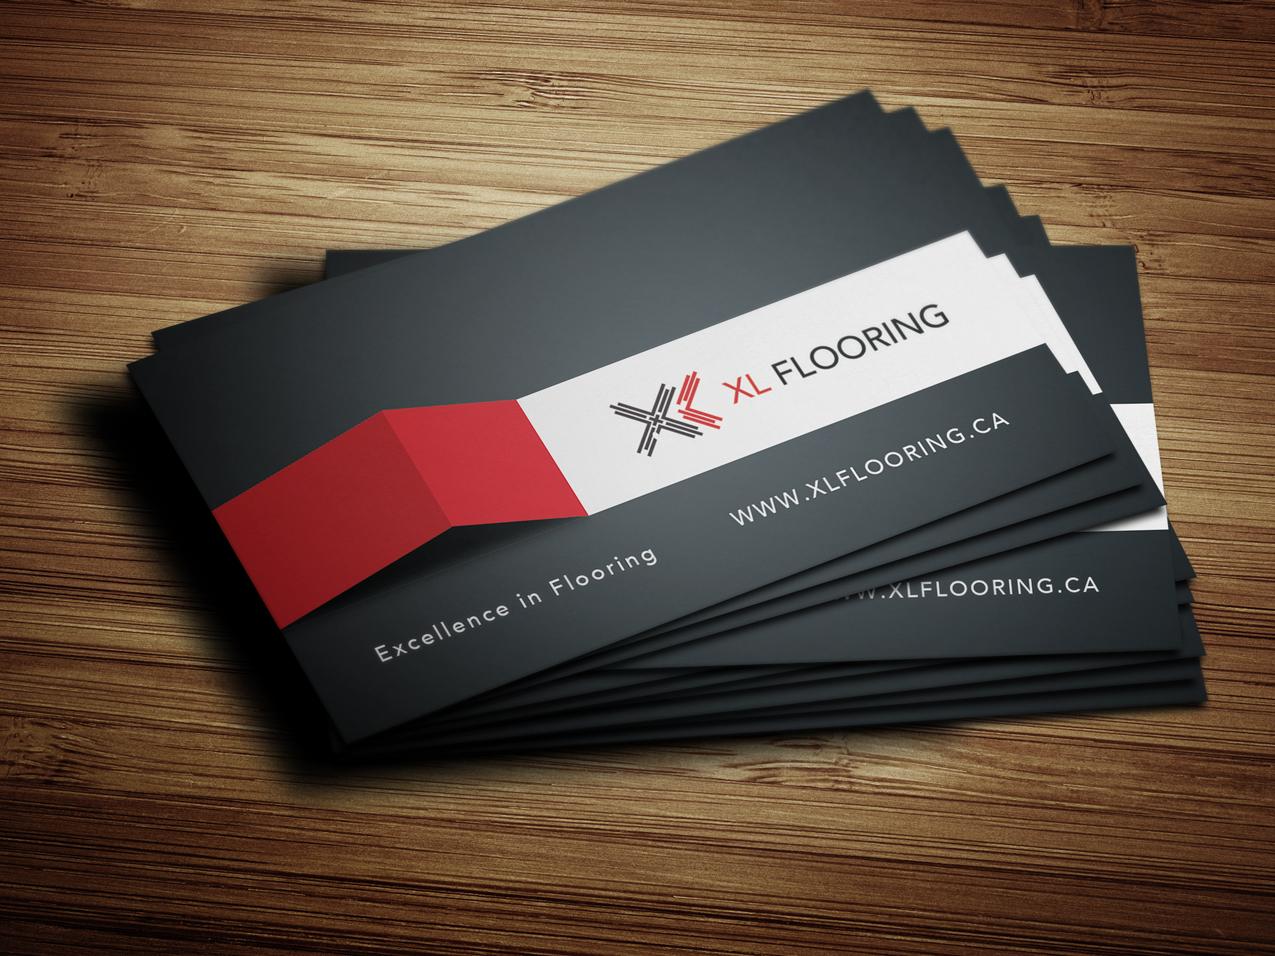 Flooring business cards design gurus floor for Flooring business cards